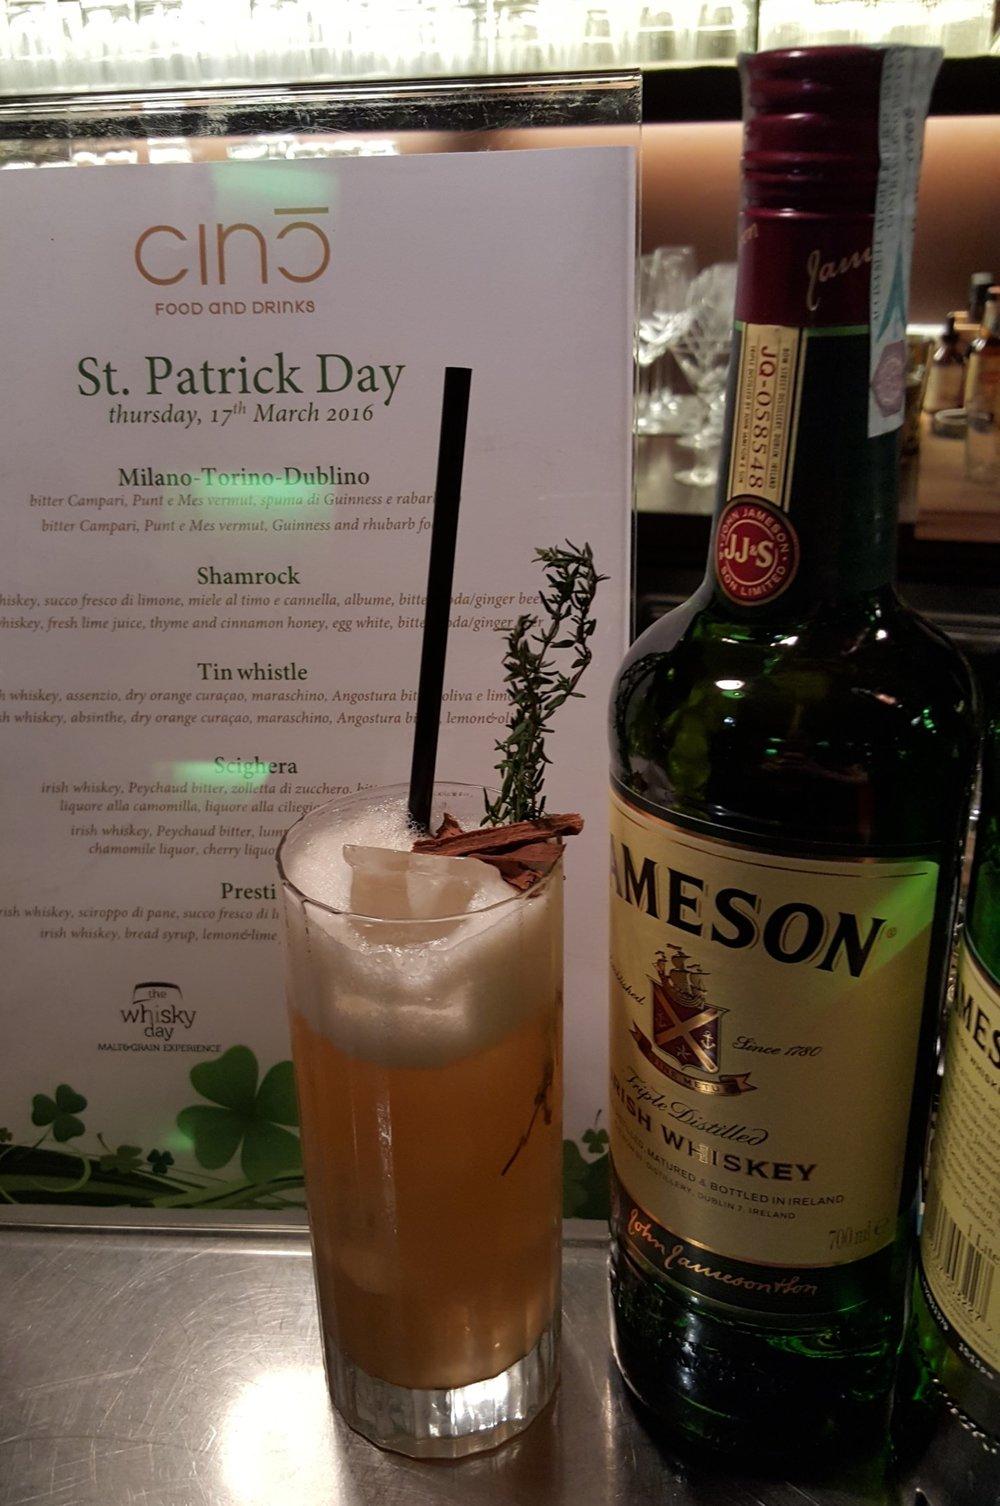 Shamrock: irish whiskey, succo fresco di limone, miele al timo e cannella, albume, bitter, soda/ginger beer